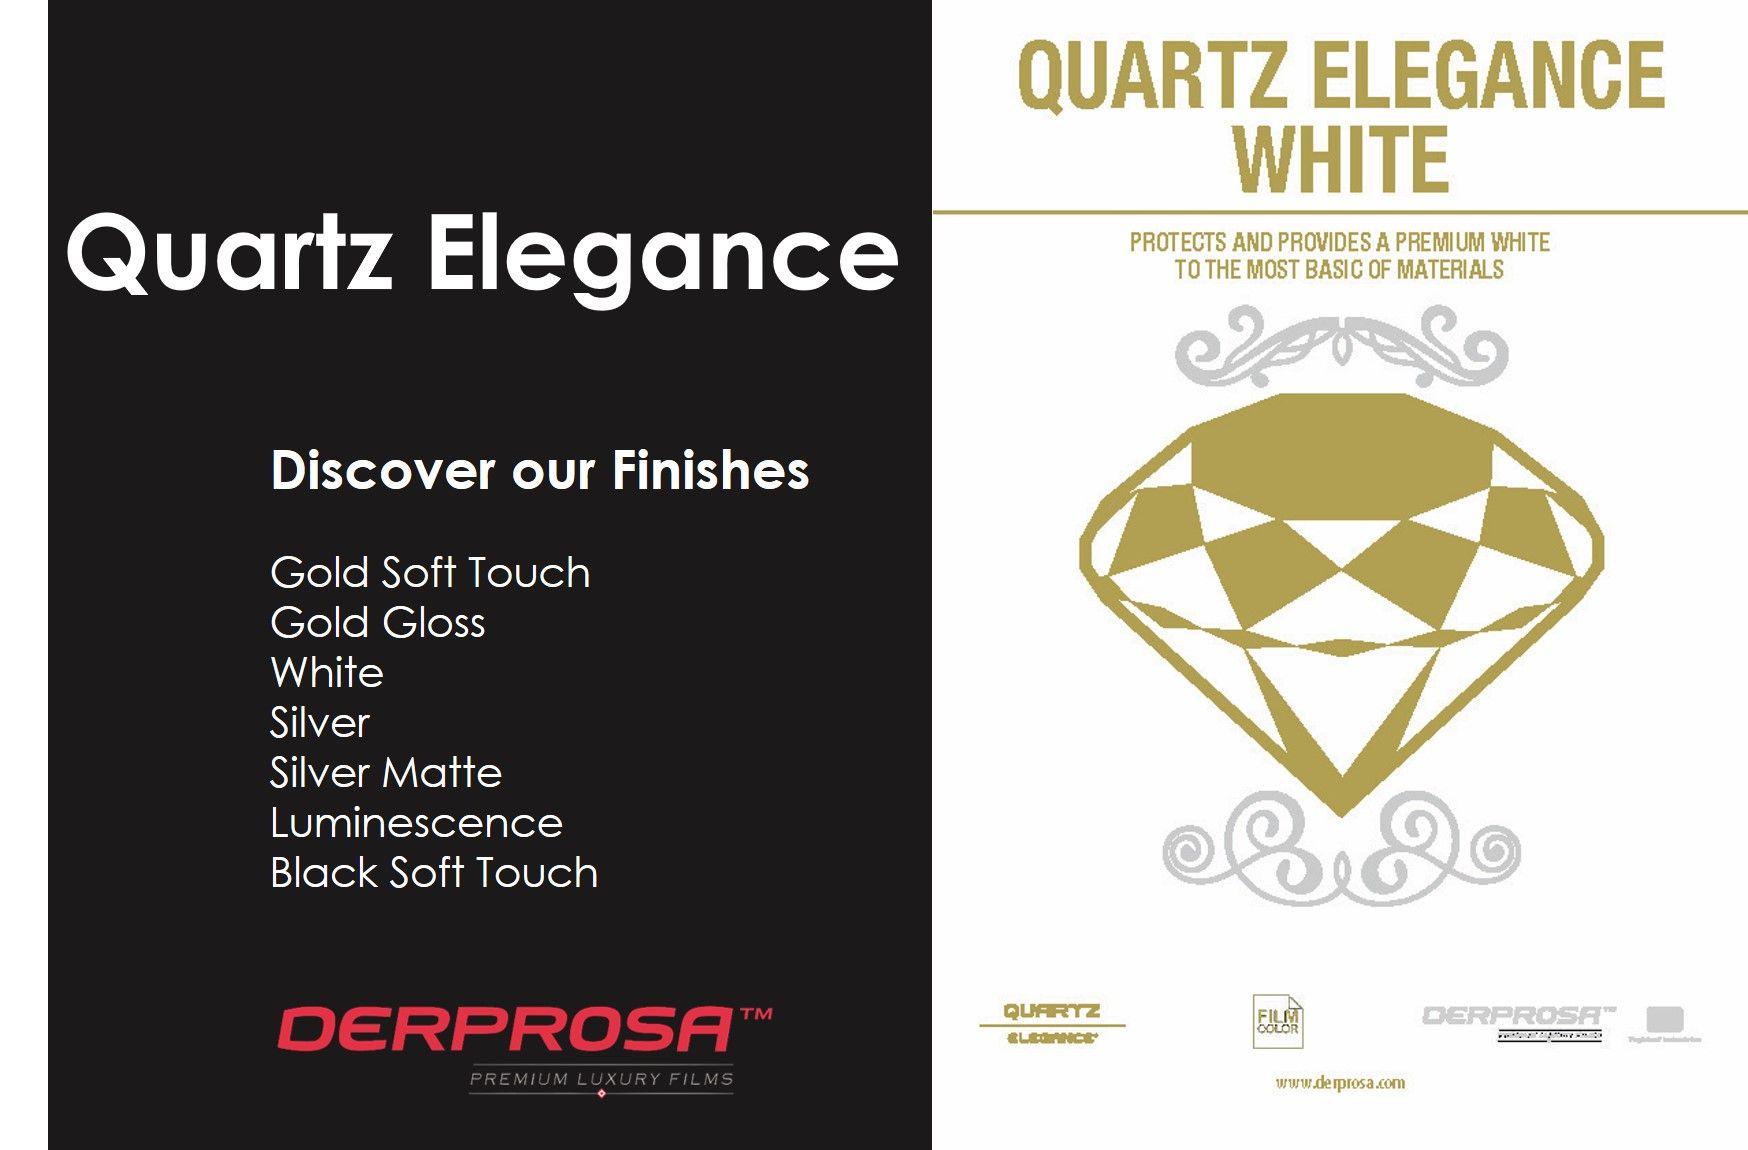 A #World of #Lamination ... #Quartz_Elegance transform a medium-low #quality_paper into a #high_quality . There is a special property for each #Quartz #Elegance . bit.ly/1RldKC2